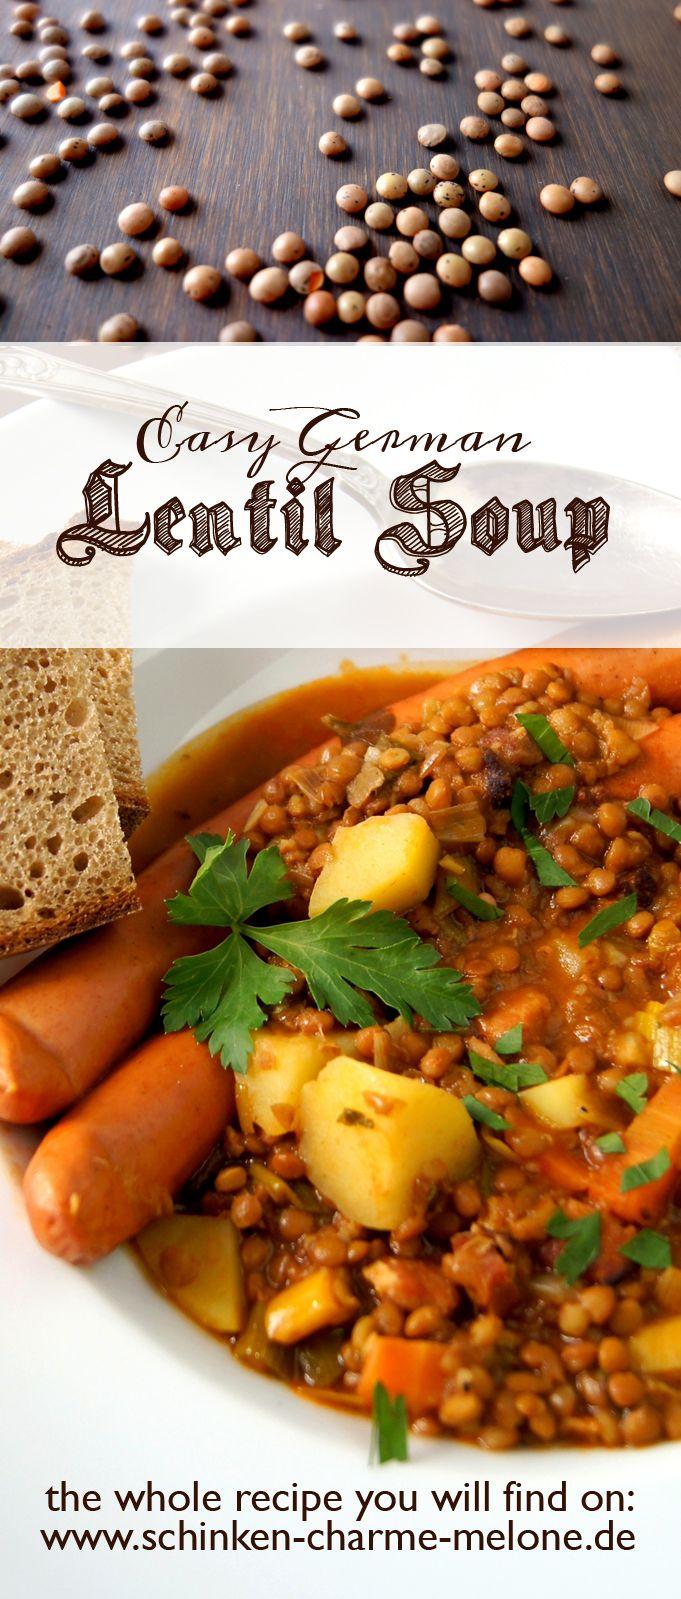 German food our lentil soup recipe brothssoups and stews german food our lentil soup recipe forumfinder Gallery